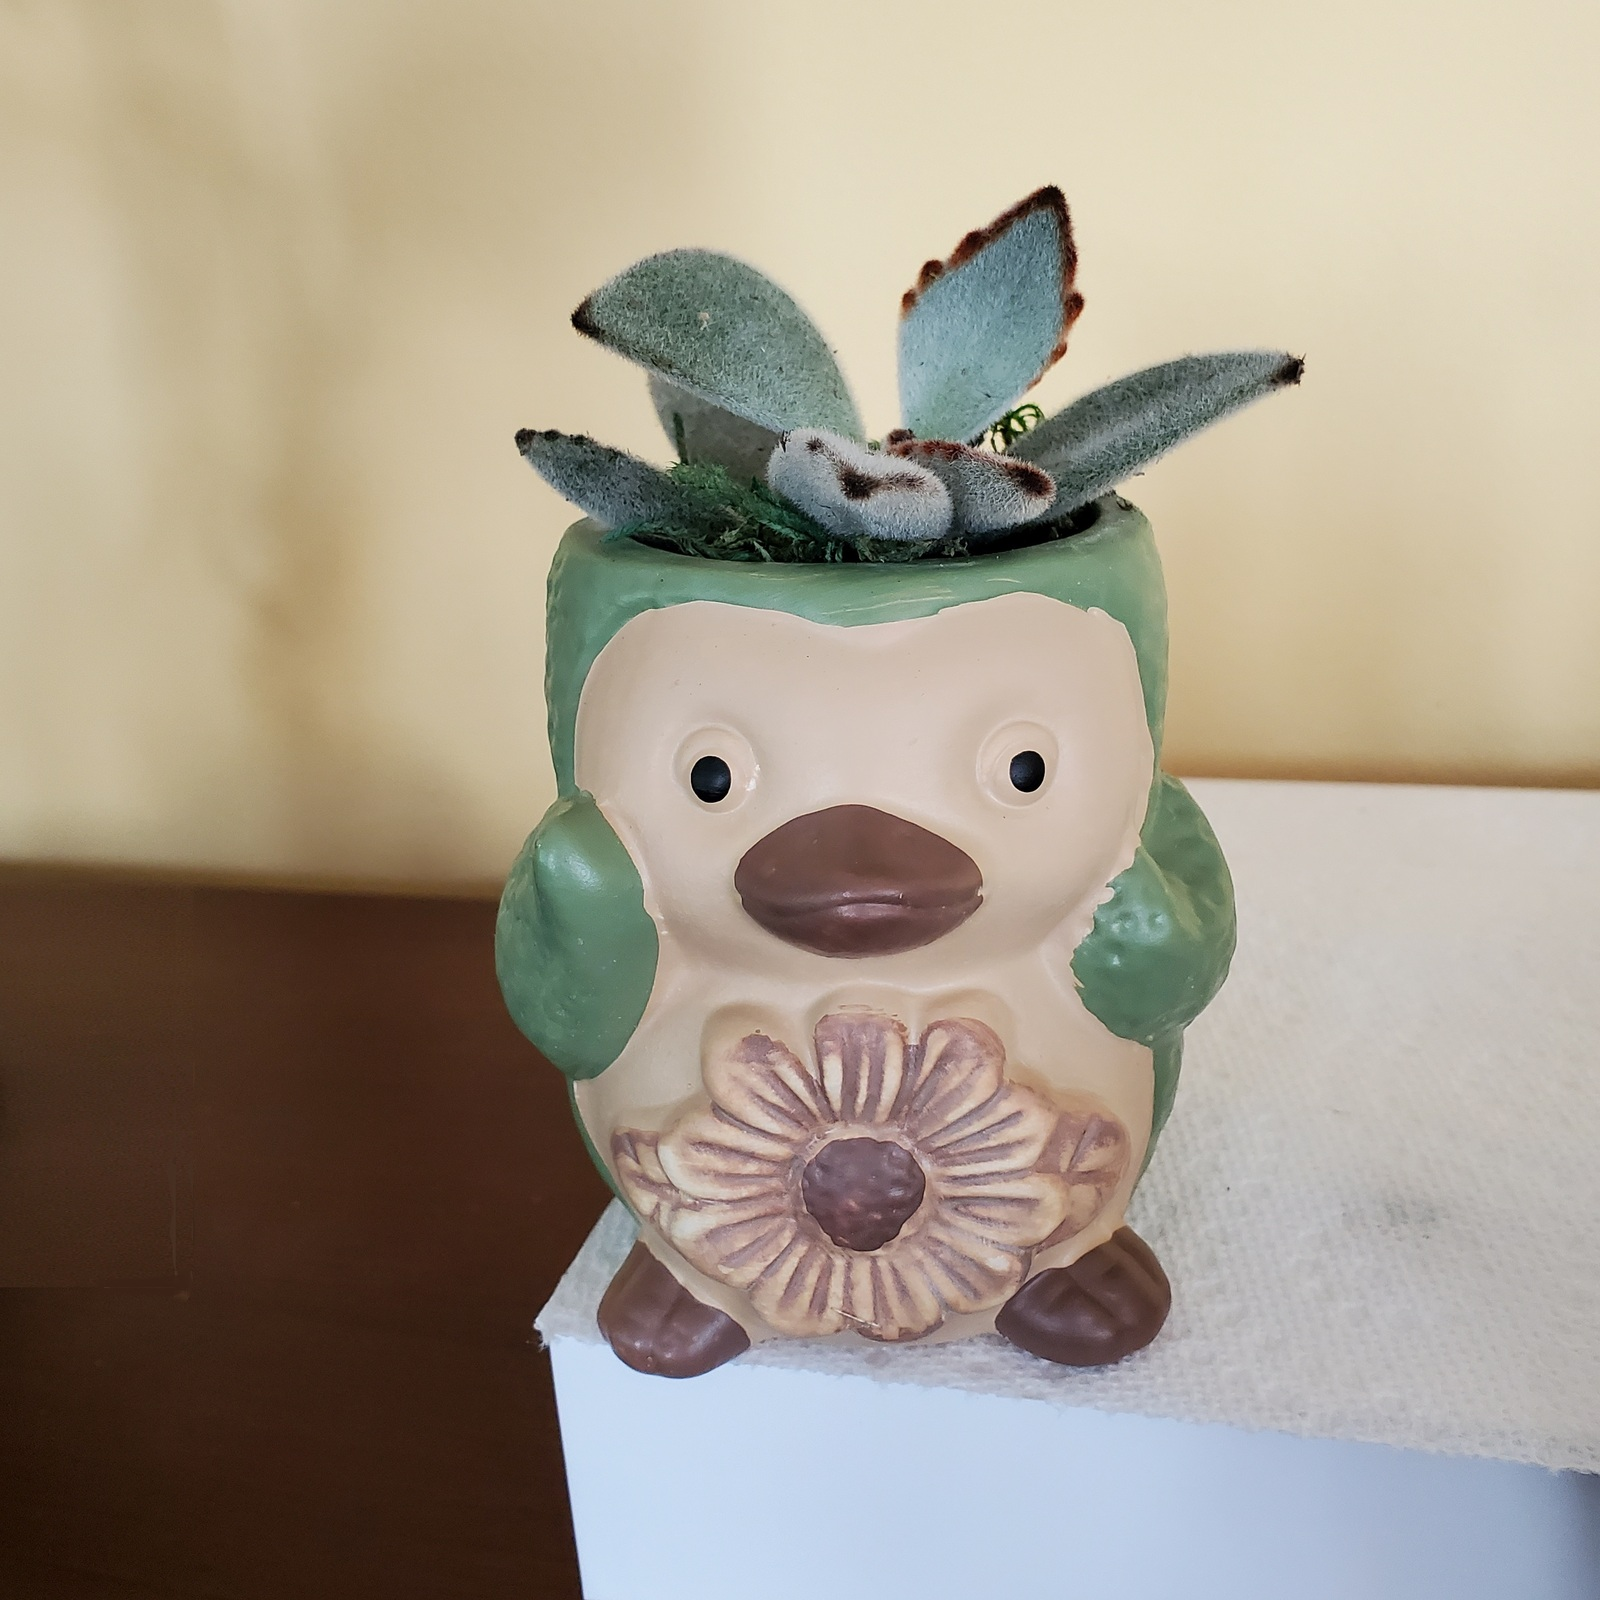 Greenpenguin pandaplant 1